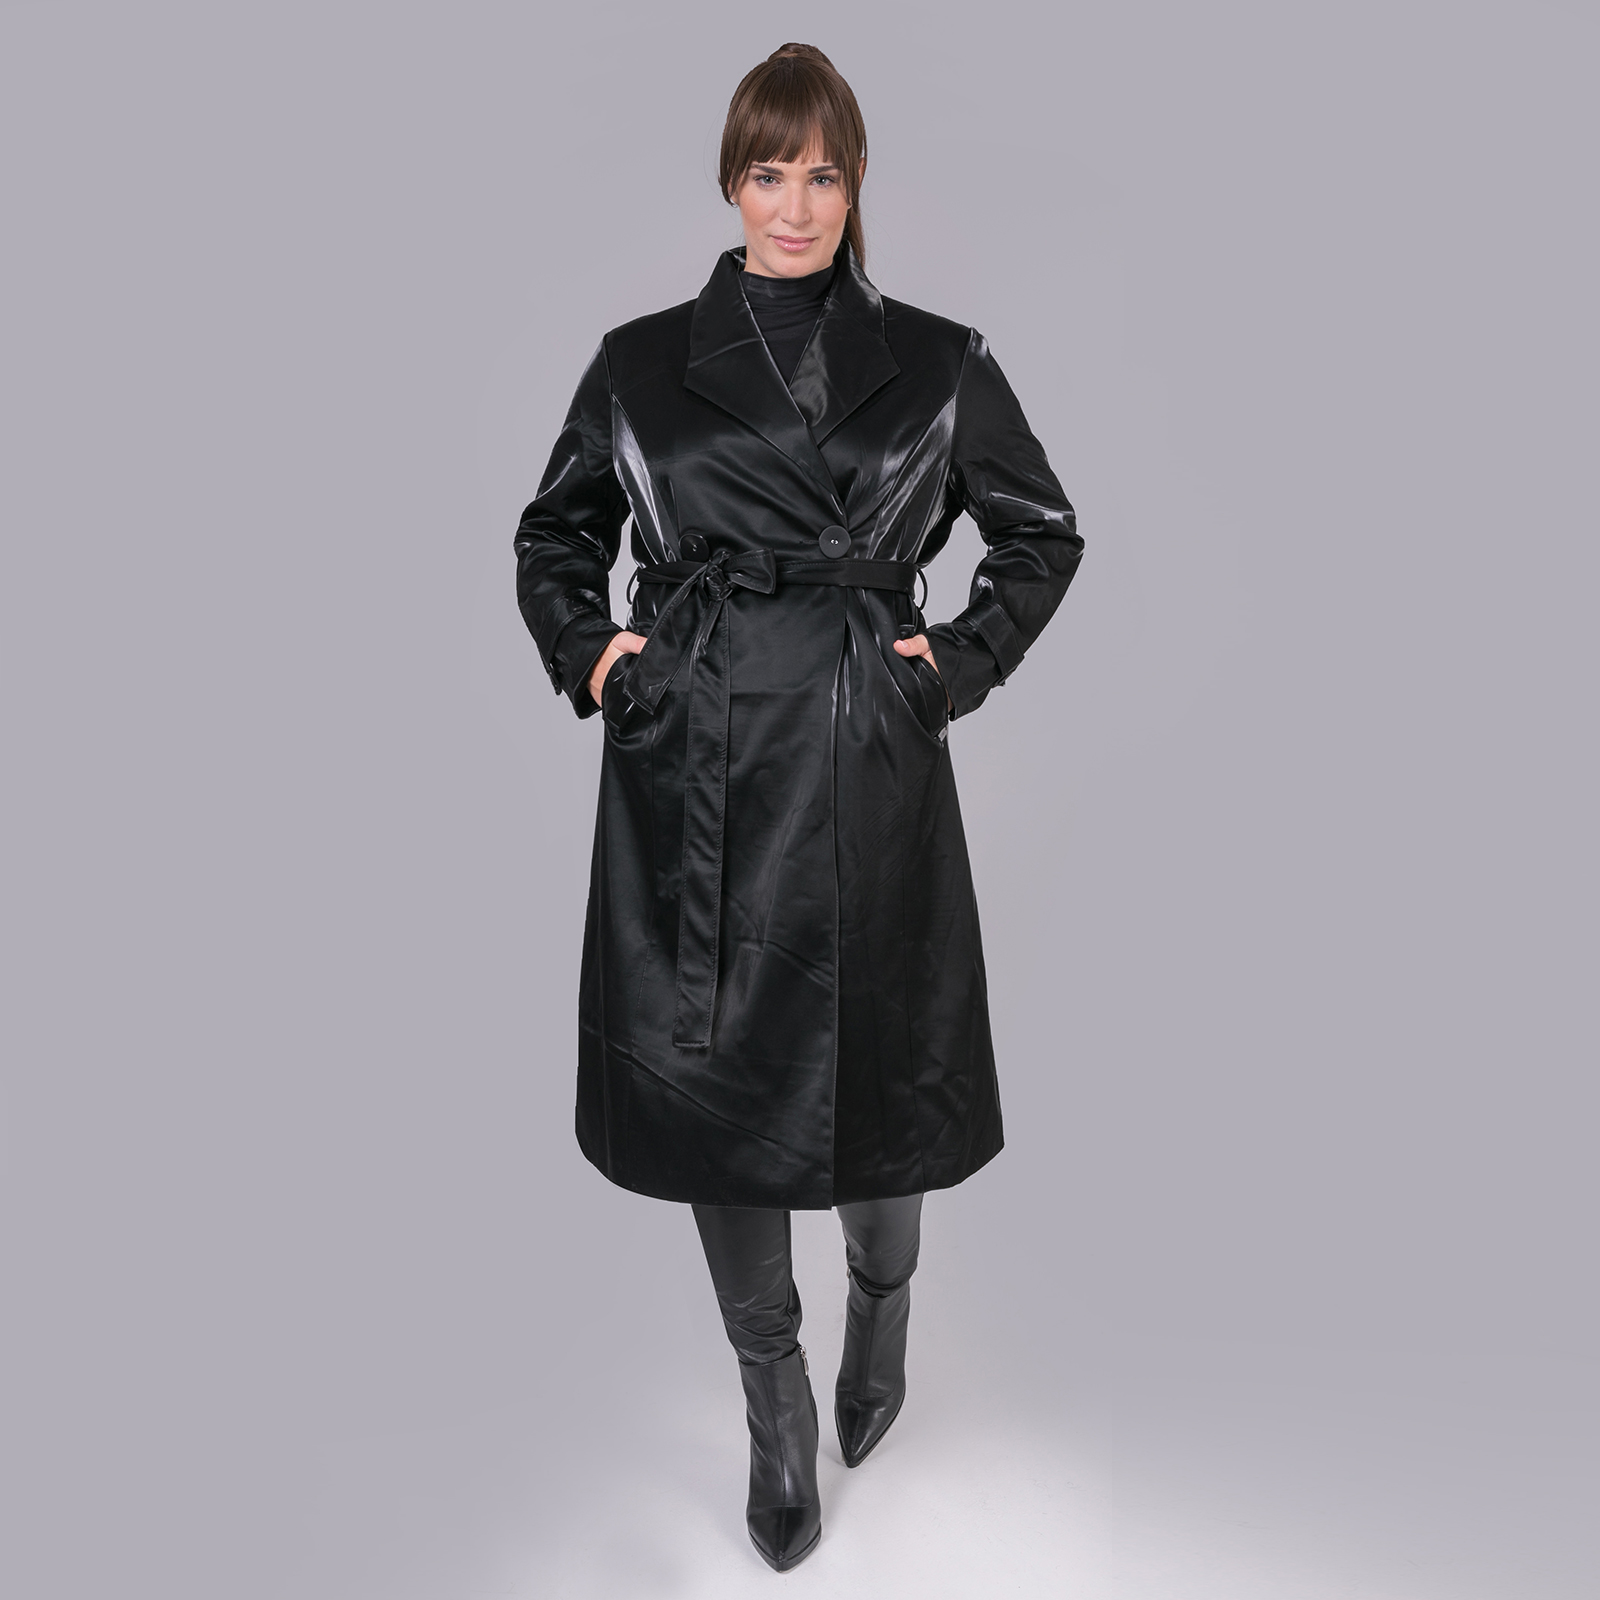 Trend Alert! Οι καμπαρντίνες αποτελούν το απόλυτο must have item για φθινόπωρο. Τα trench coats είναι μία τέλεια λύση για τις πρώτες %27δροσερές%27 μέρες. Αυτό το vinyl κομμάτι όμως είναι απλά συγκλονιστικό %26 θα κάνει το outfit σου πιο stylish από ποτέ.... Απογείωσε το look με total white sneakers ή ankle boots %26 εκκεντρικά αξεσουάρ. P.S. Φοριέται και σαν φόρεμα!